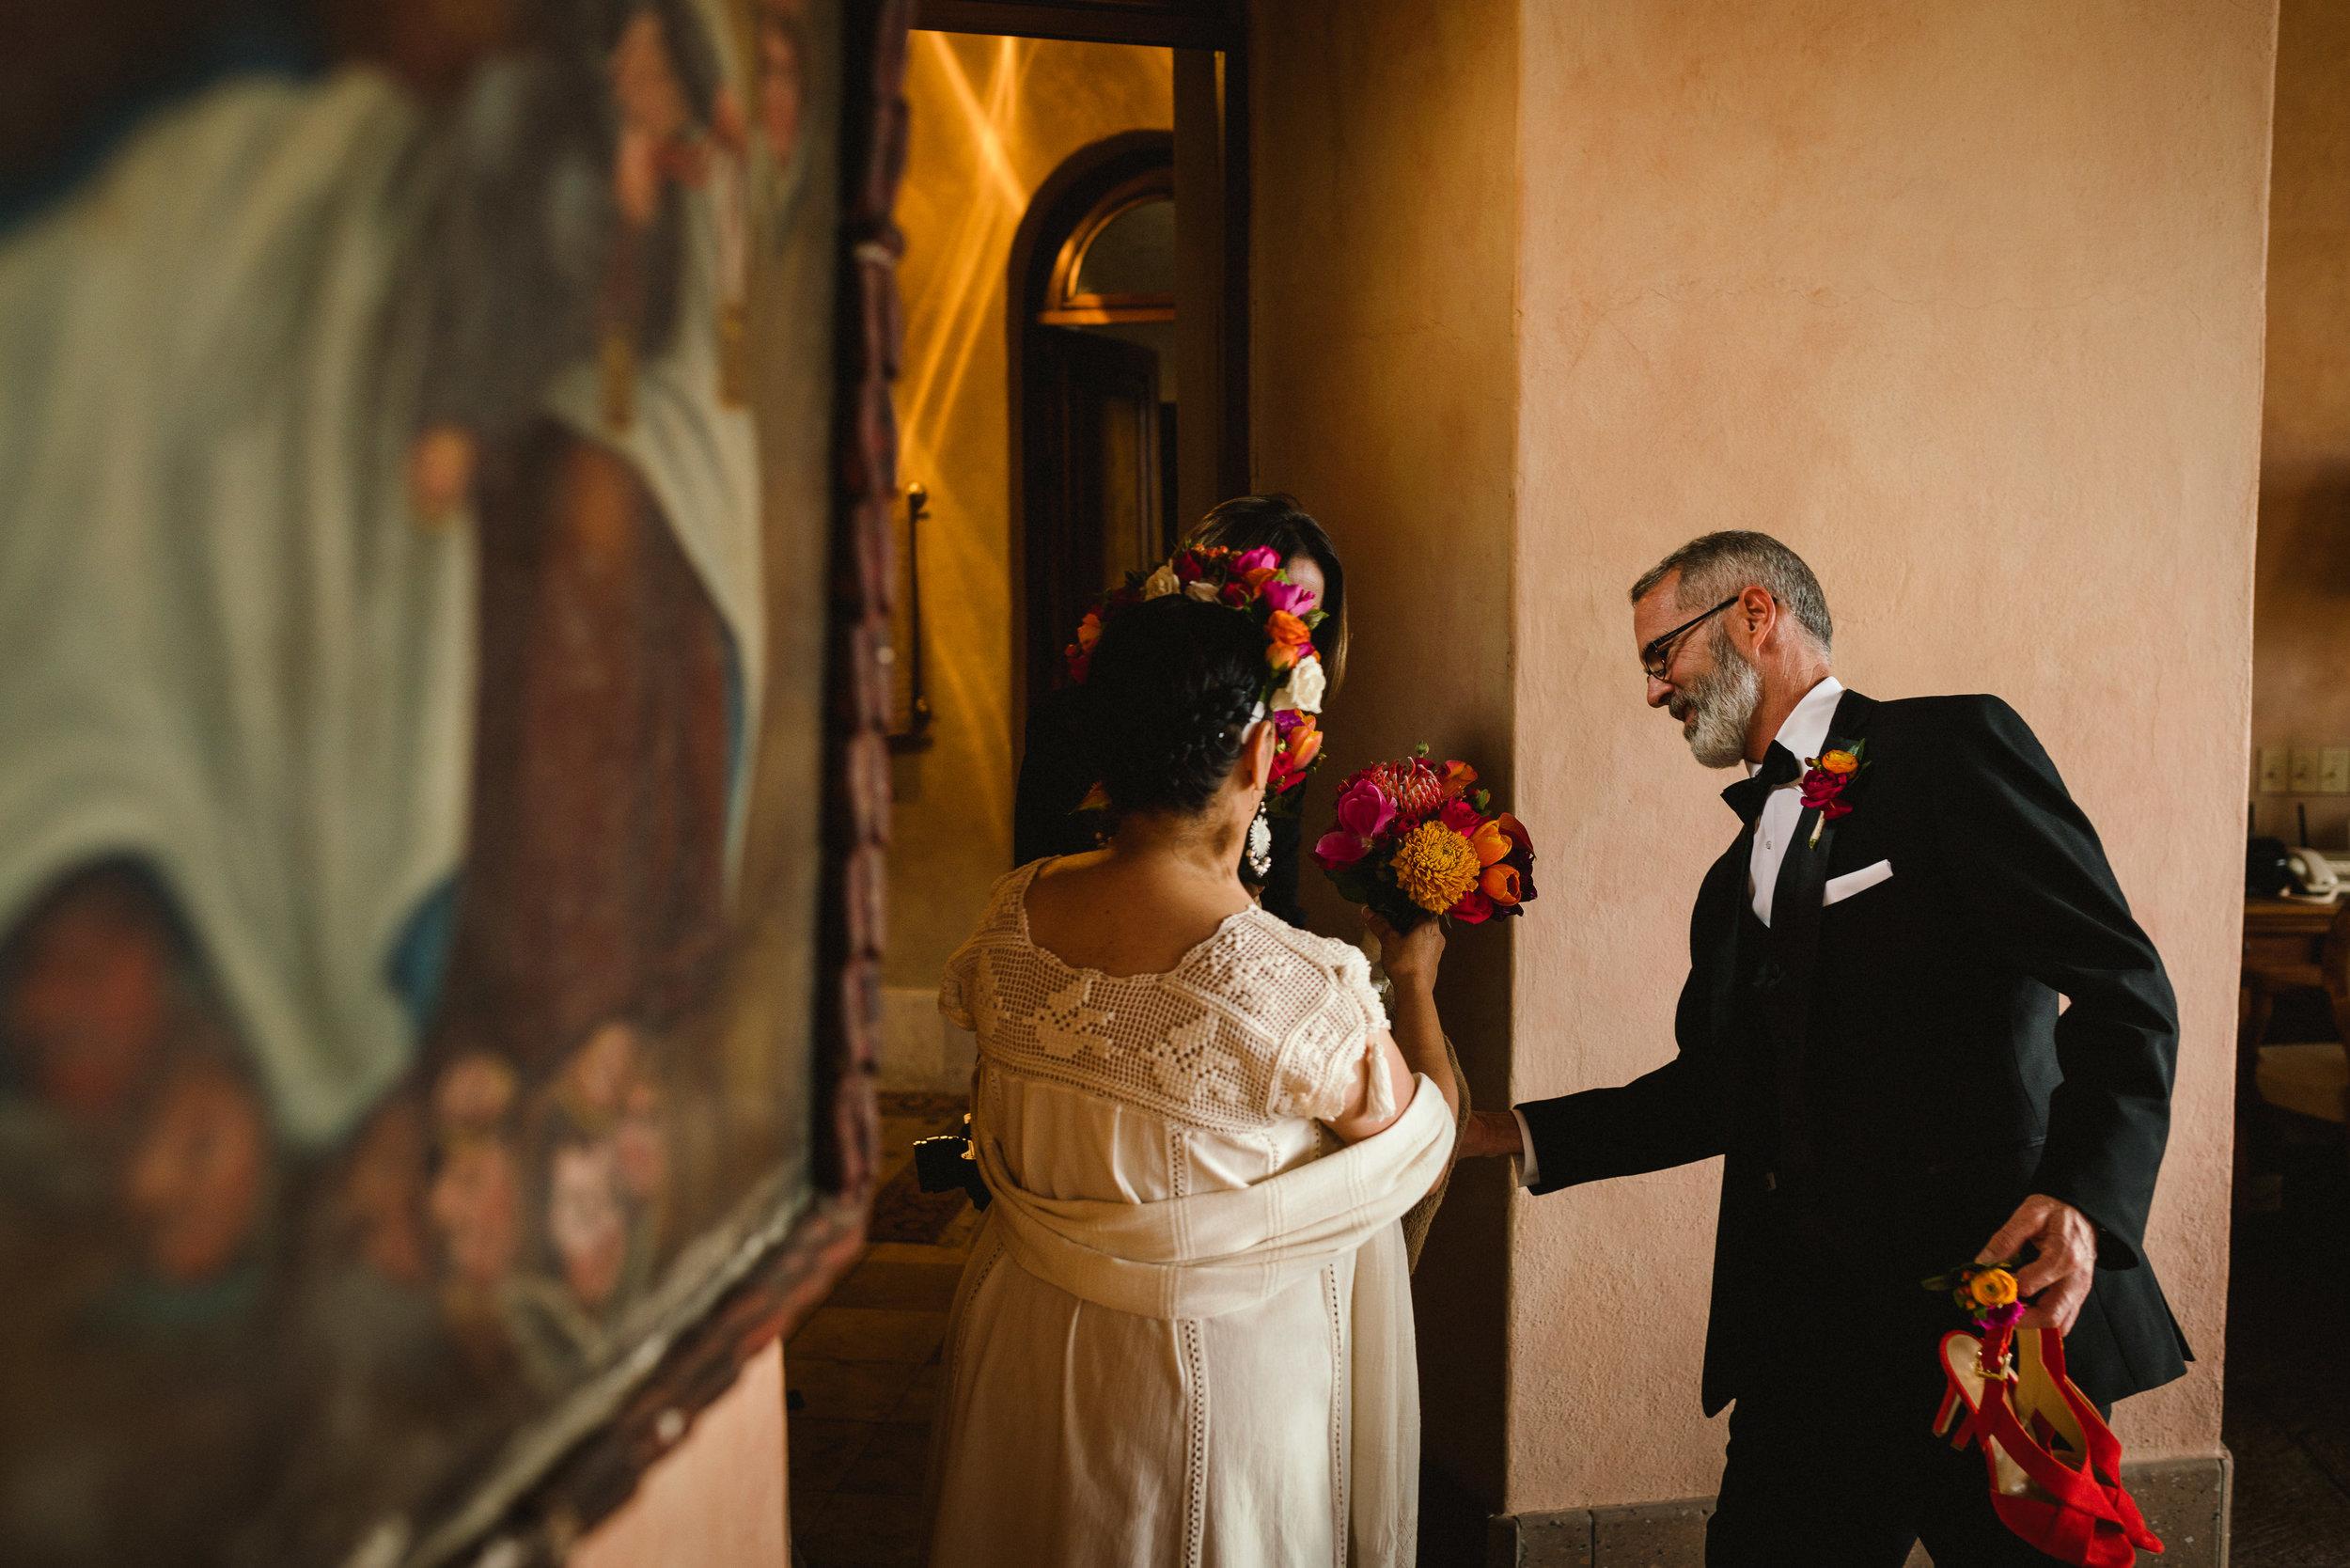 MaurizioSolisBroca-casa-carino-san-miguel-de-allende-wedding-33.jpg